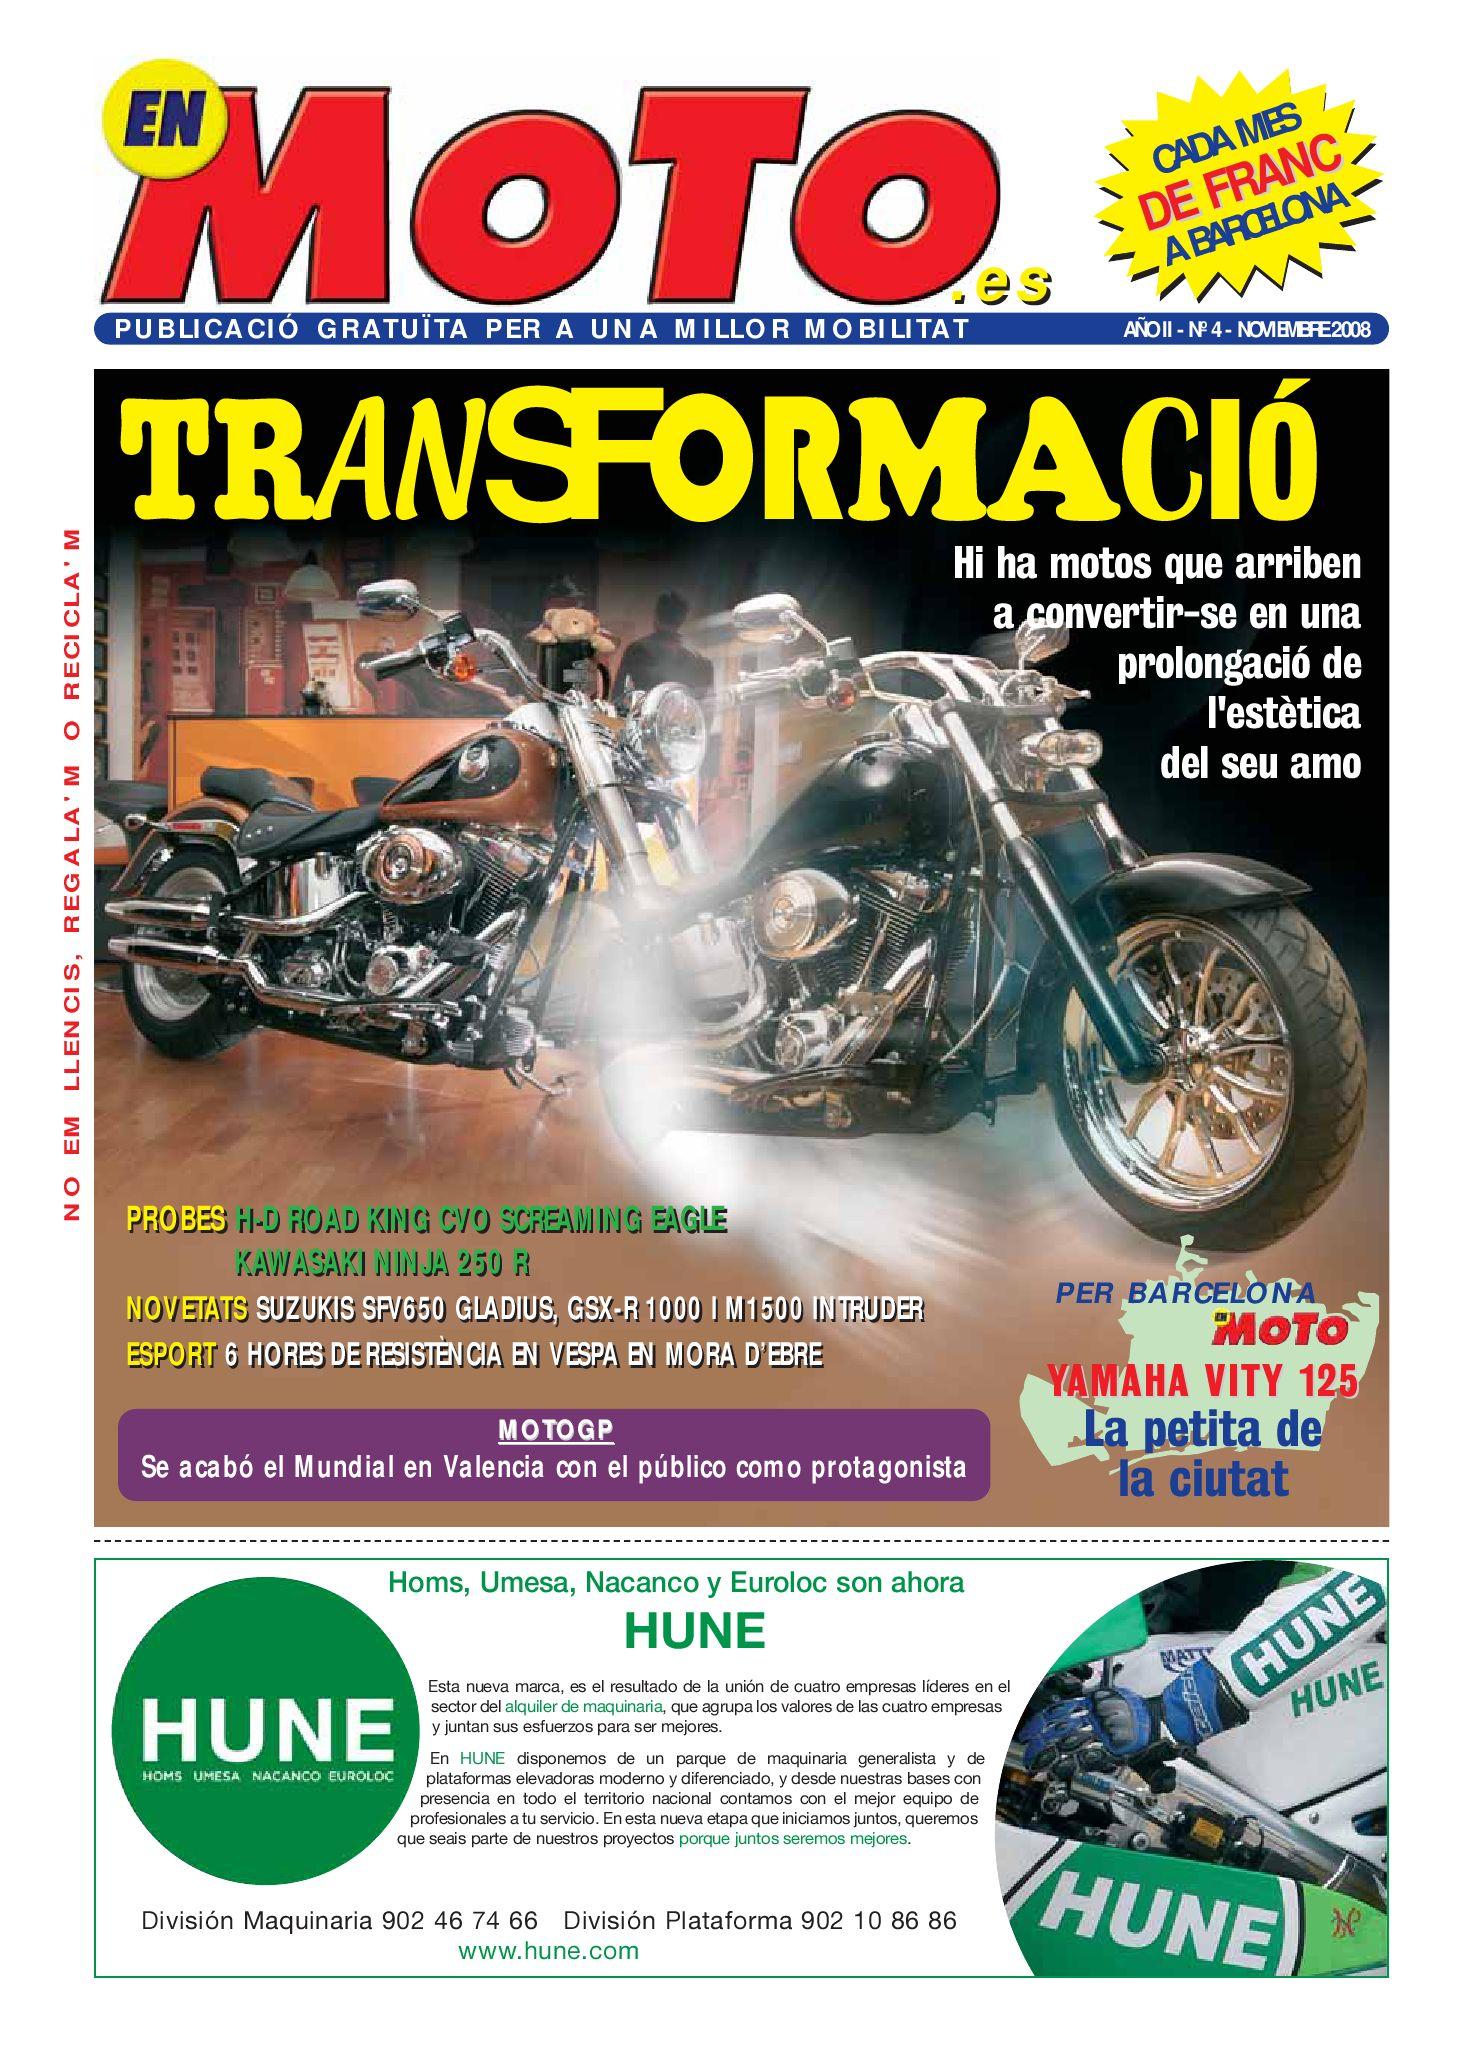 Delantero Cilindro Maestro Kit FITS Honda VTR 1000 Fv 1997 1000 Cc